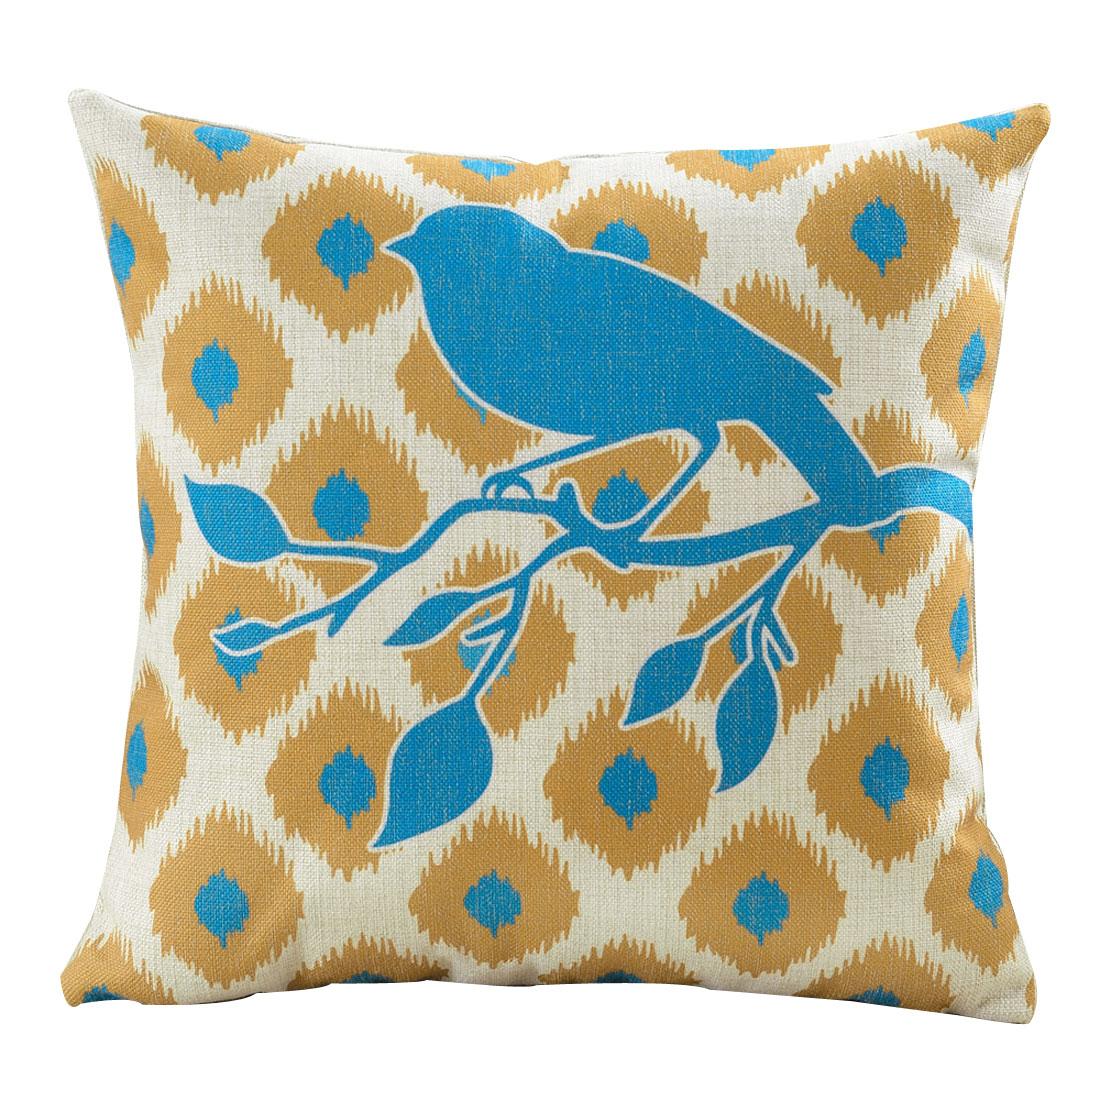 Home Sofa Cotton Linen Pop Geometric Pattern Waist Back Cushion Pillow Cover